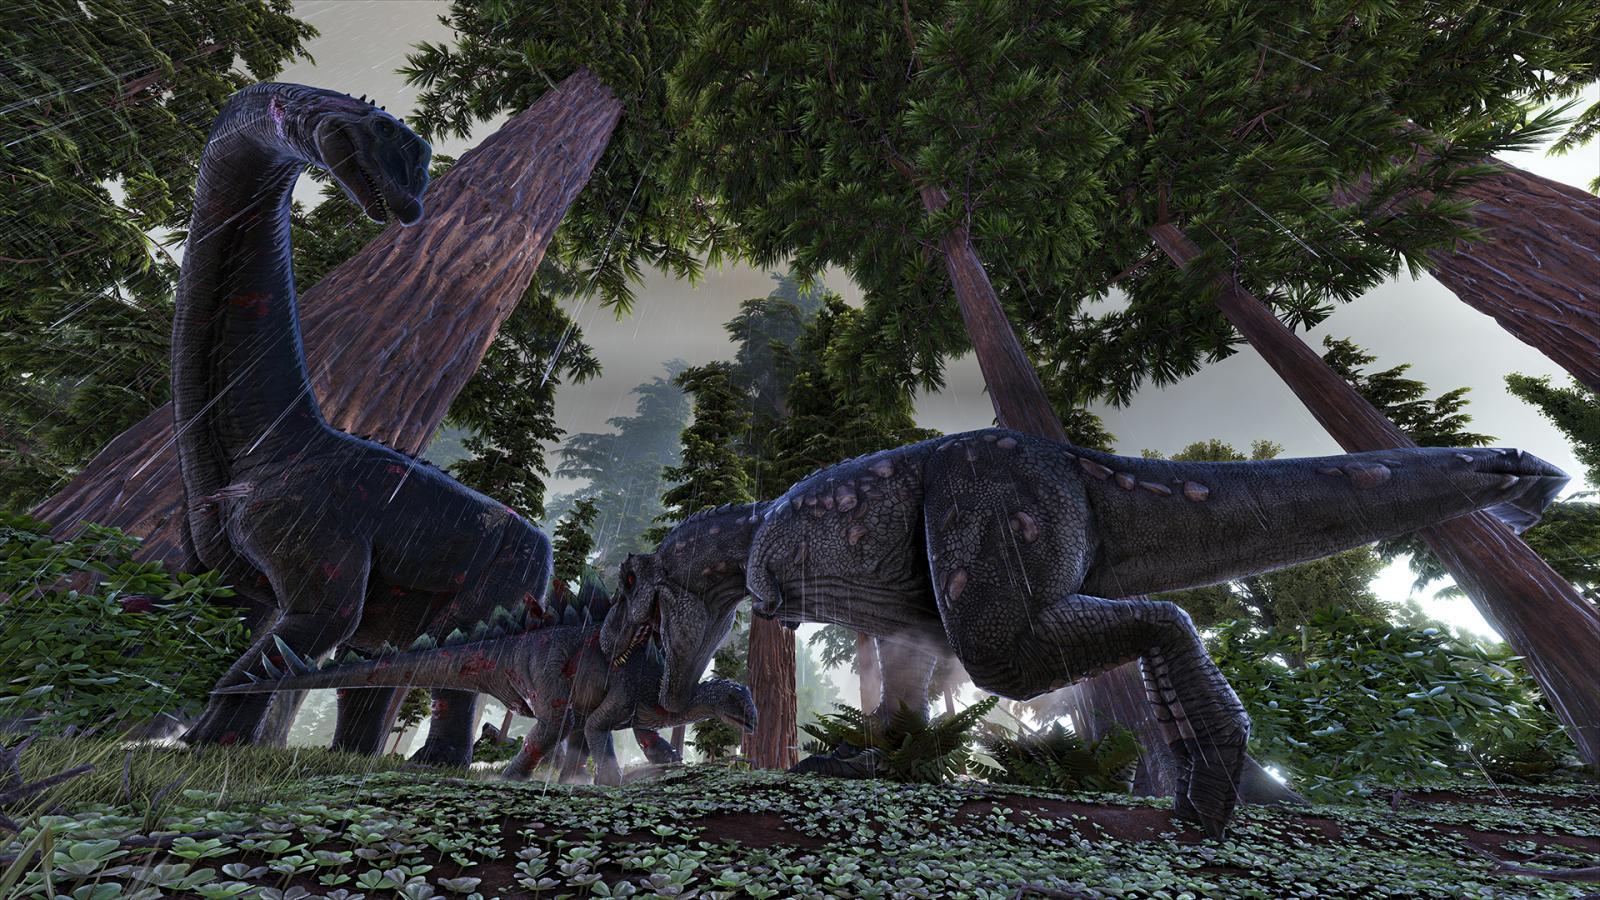 large.58d5b9035a103_DinosinAction5-Mantikoa-SuperResolution.jpg